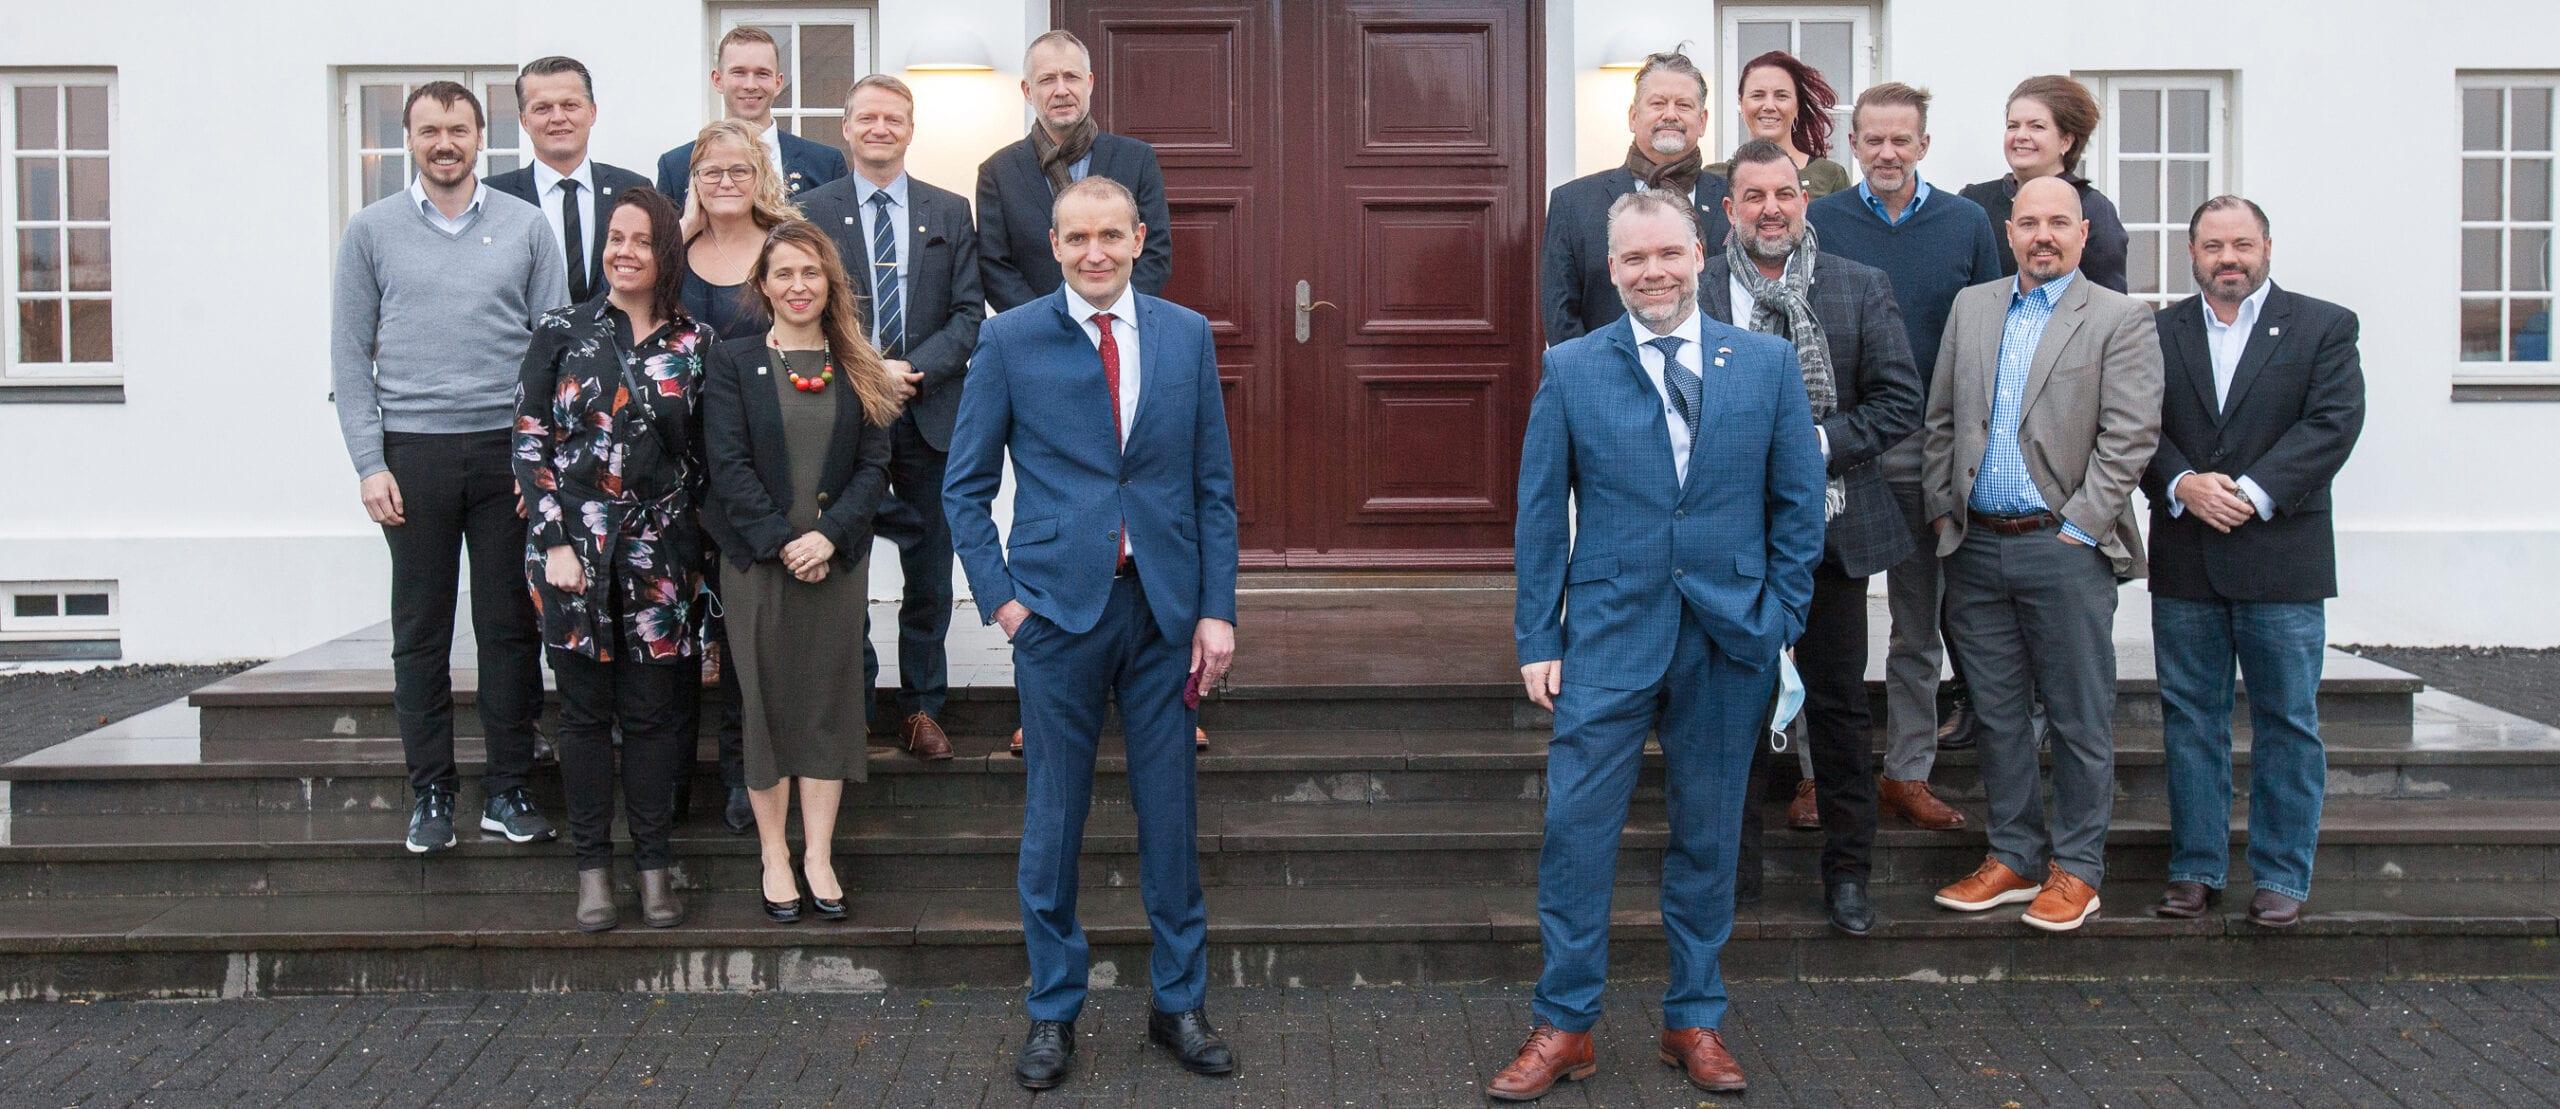 President of Iceland Welcomes Kerecis